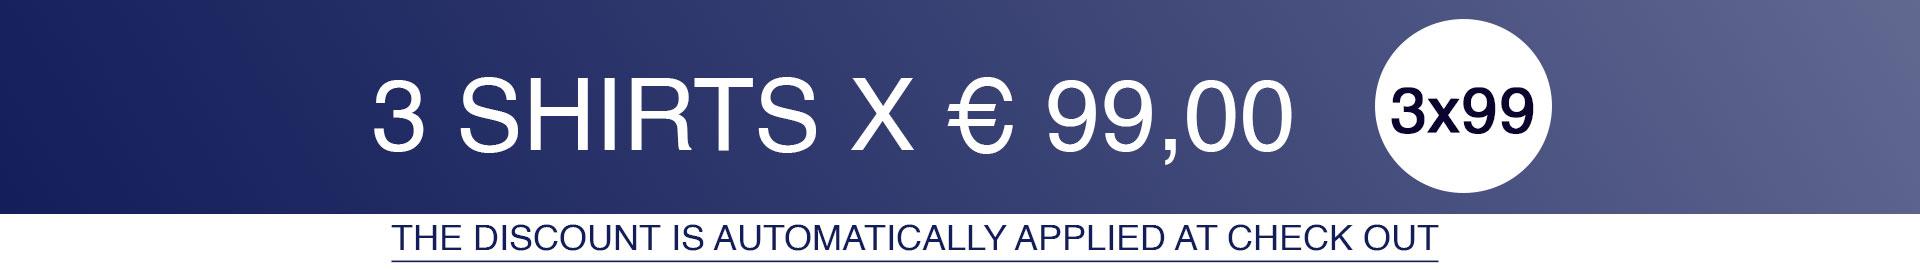 Promo 3x99